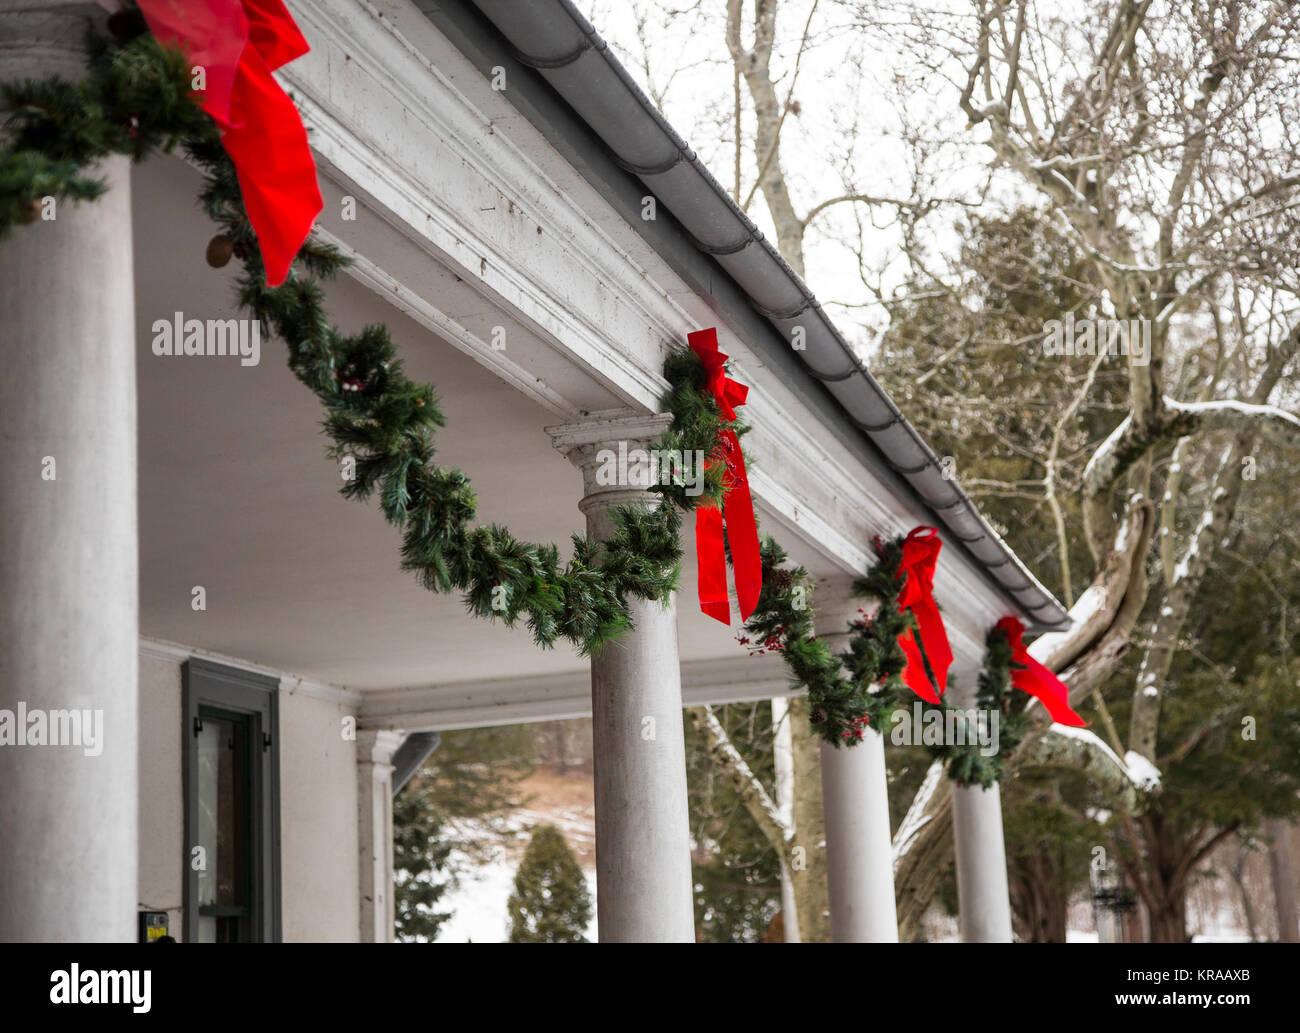 Christmas garland at the Ringwood Manor in Ringwood, NJ - Stock Image